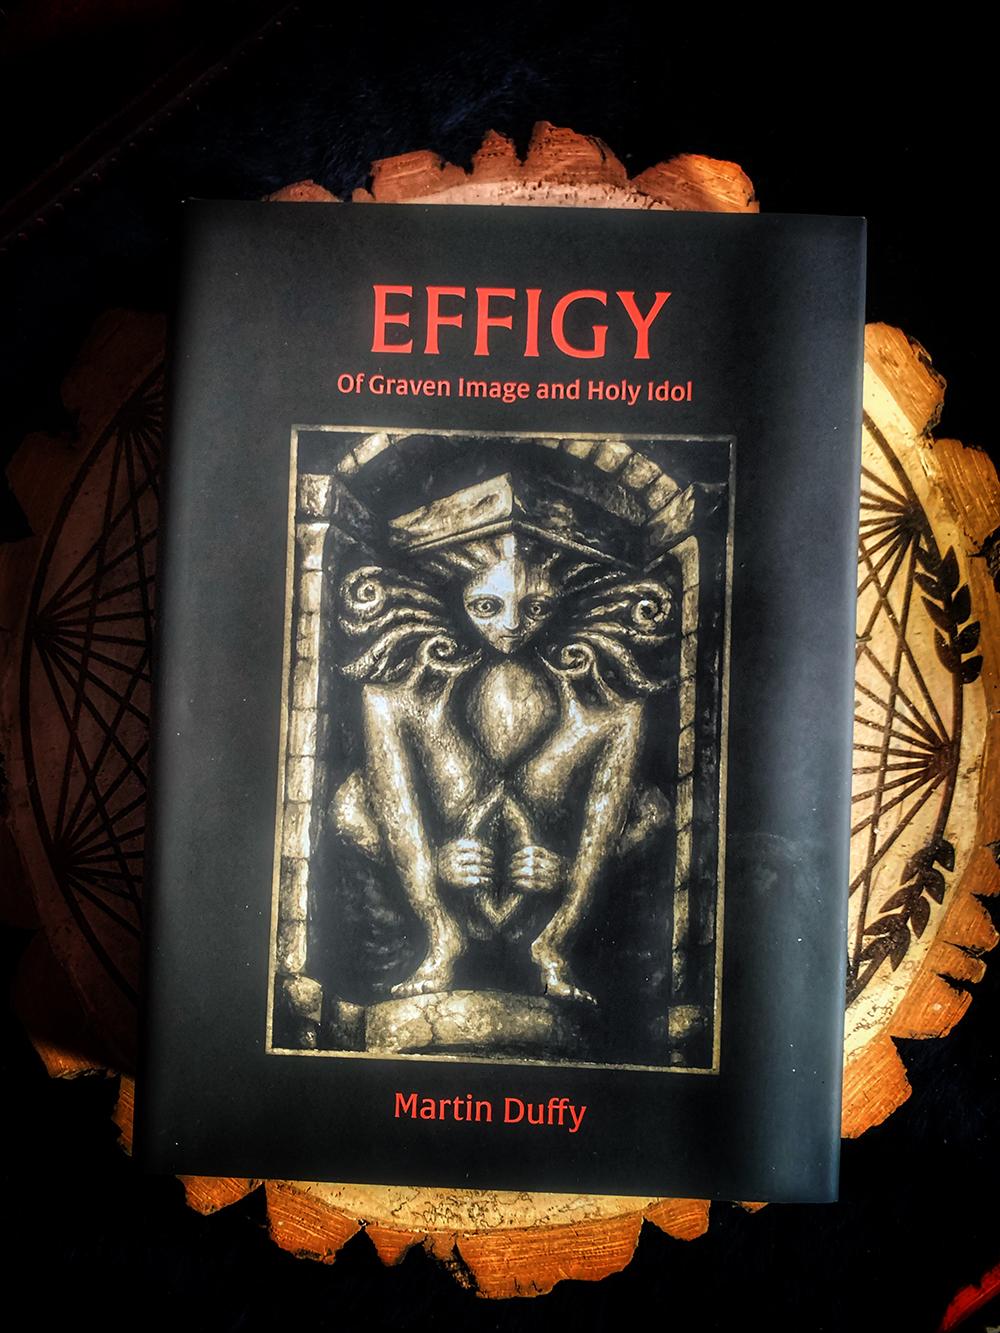 Effigy Graven Image and Holy Idol